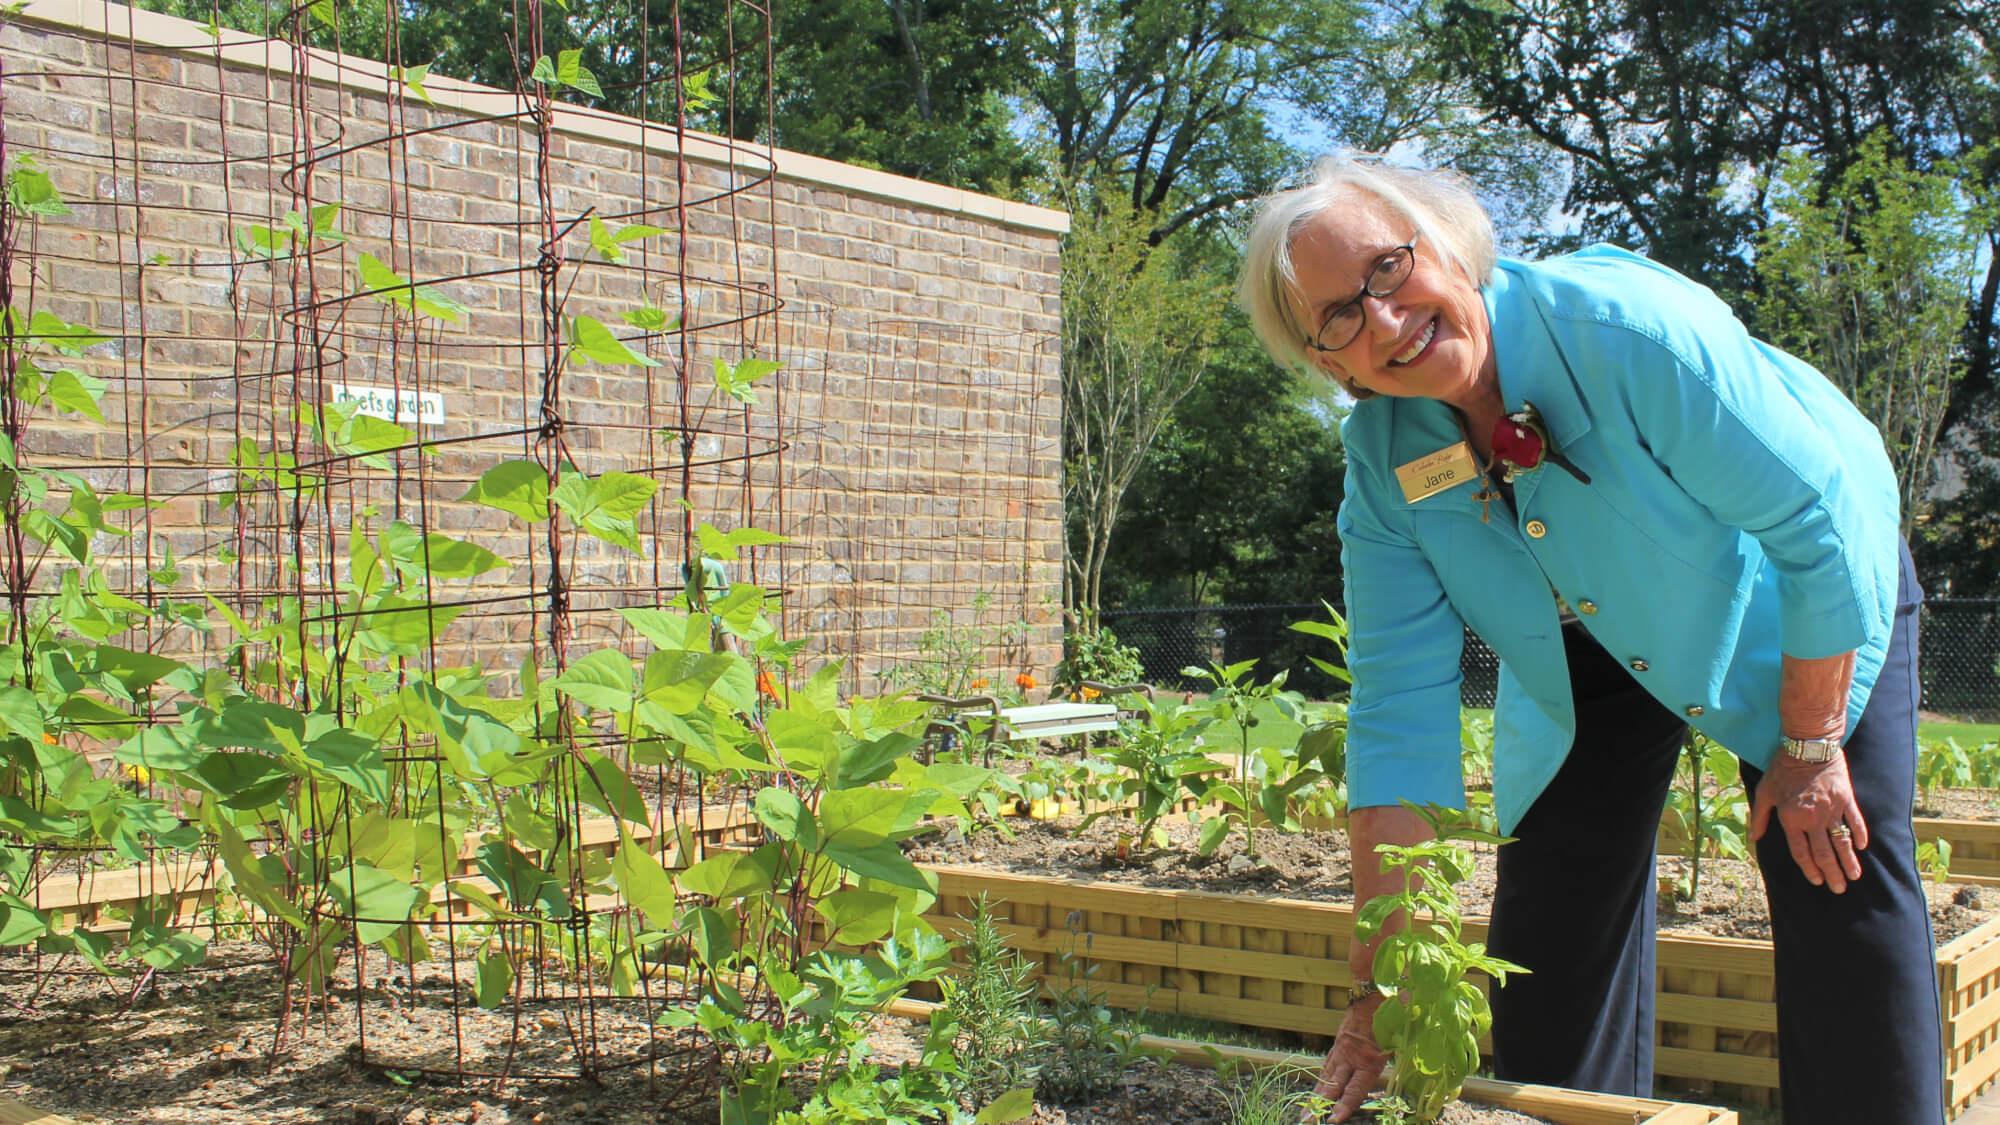 Resident Jane helping tend Chef's Garden